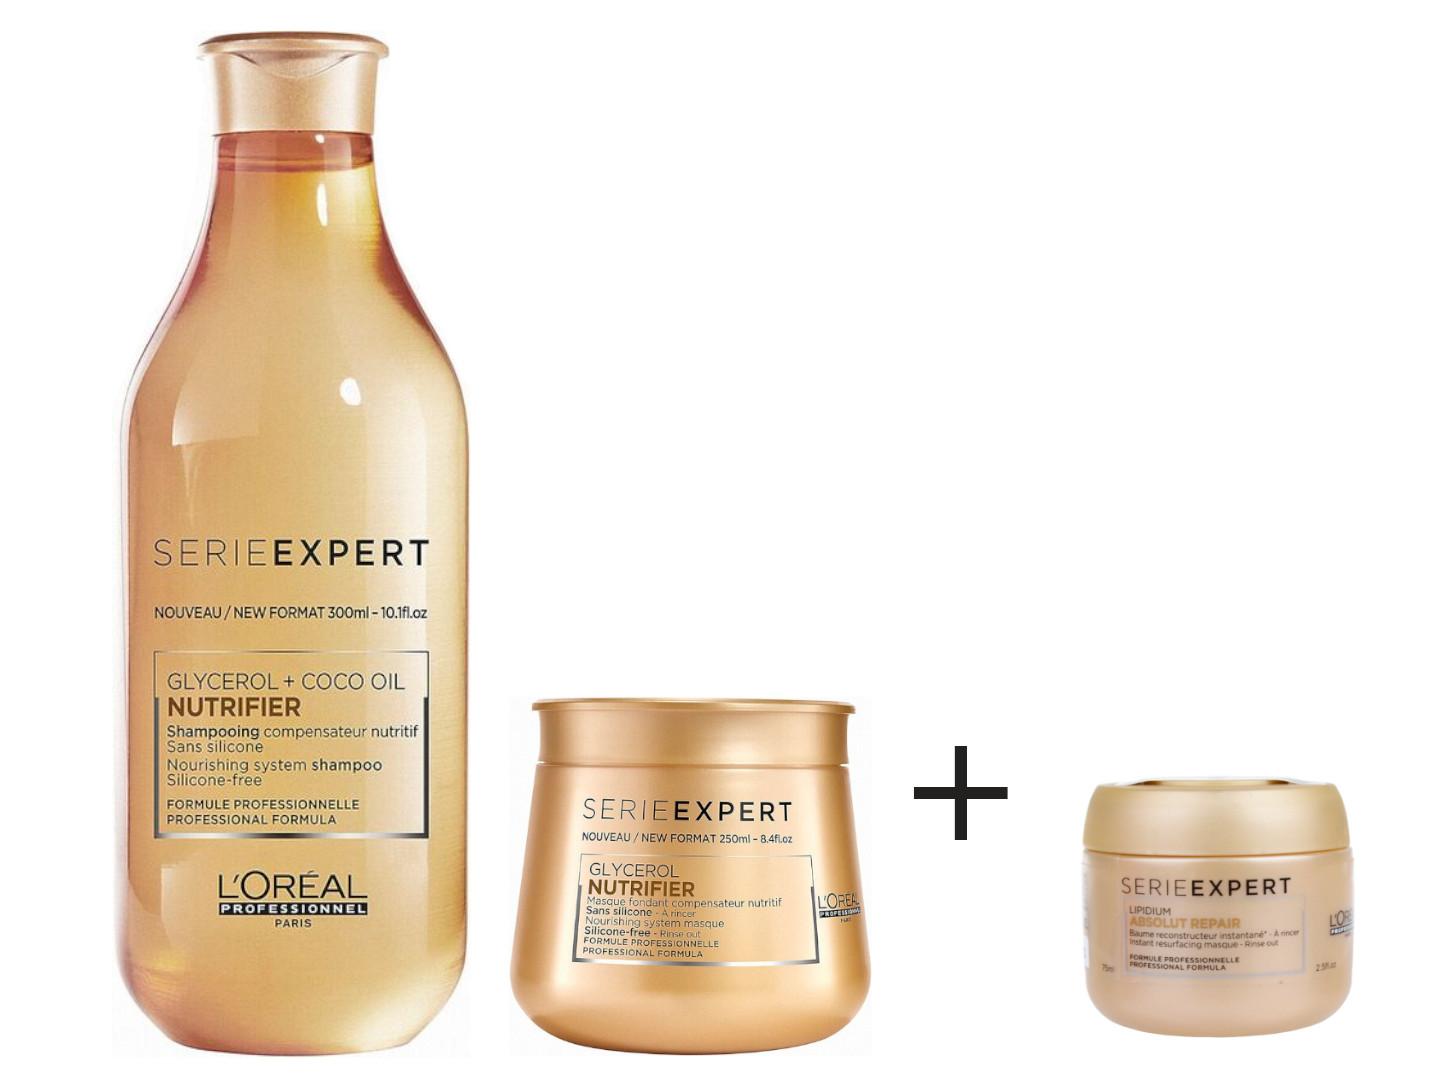 Sada pro suché vlasy Loréal Nutrifier + maska Absolut Repair Lipidium 75 ml zdarma + DÁREK ZDARMA